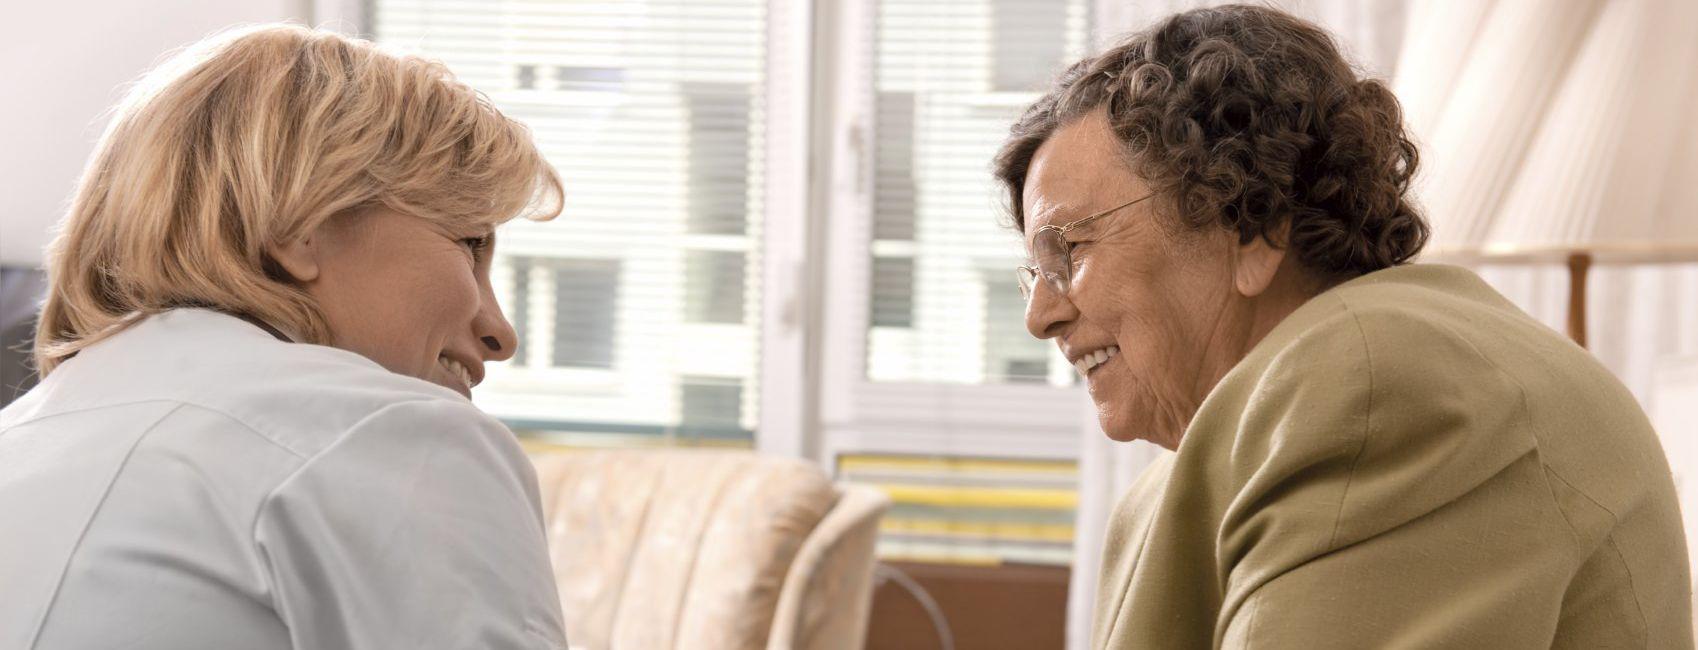 Haushaltshilfe Pflegestufe 2